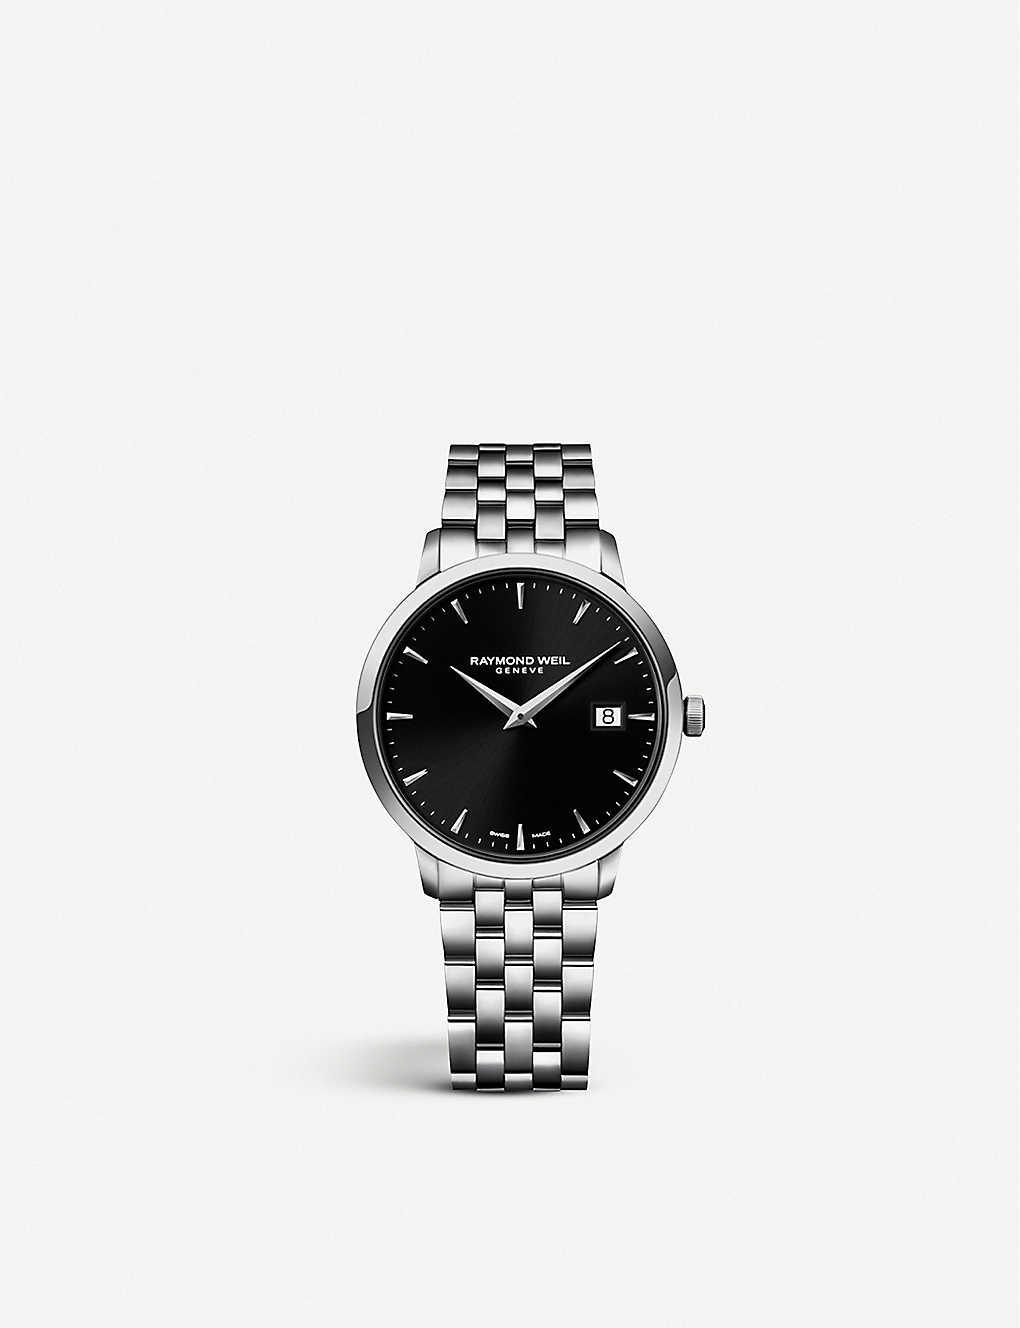 Raymond Weil 5488 St 20001 Toccata Stainless Steel Watch